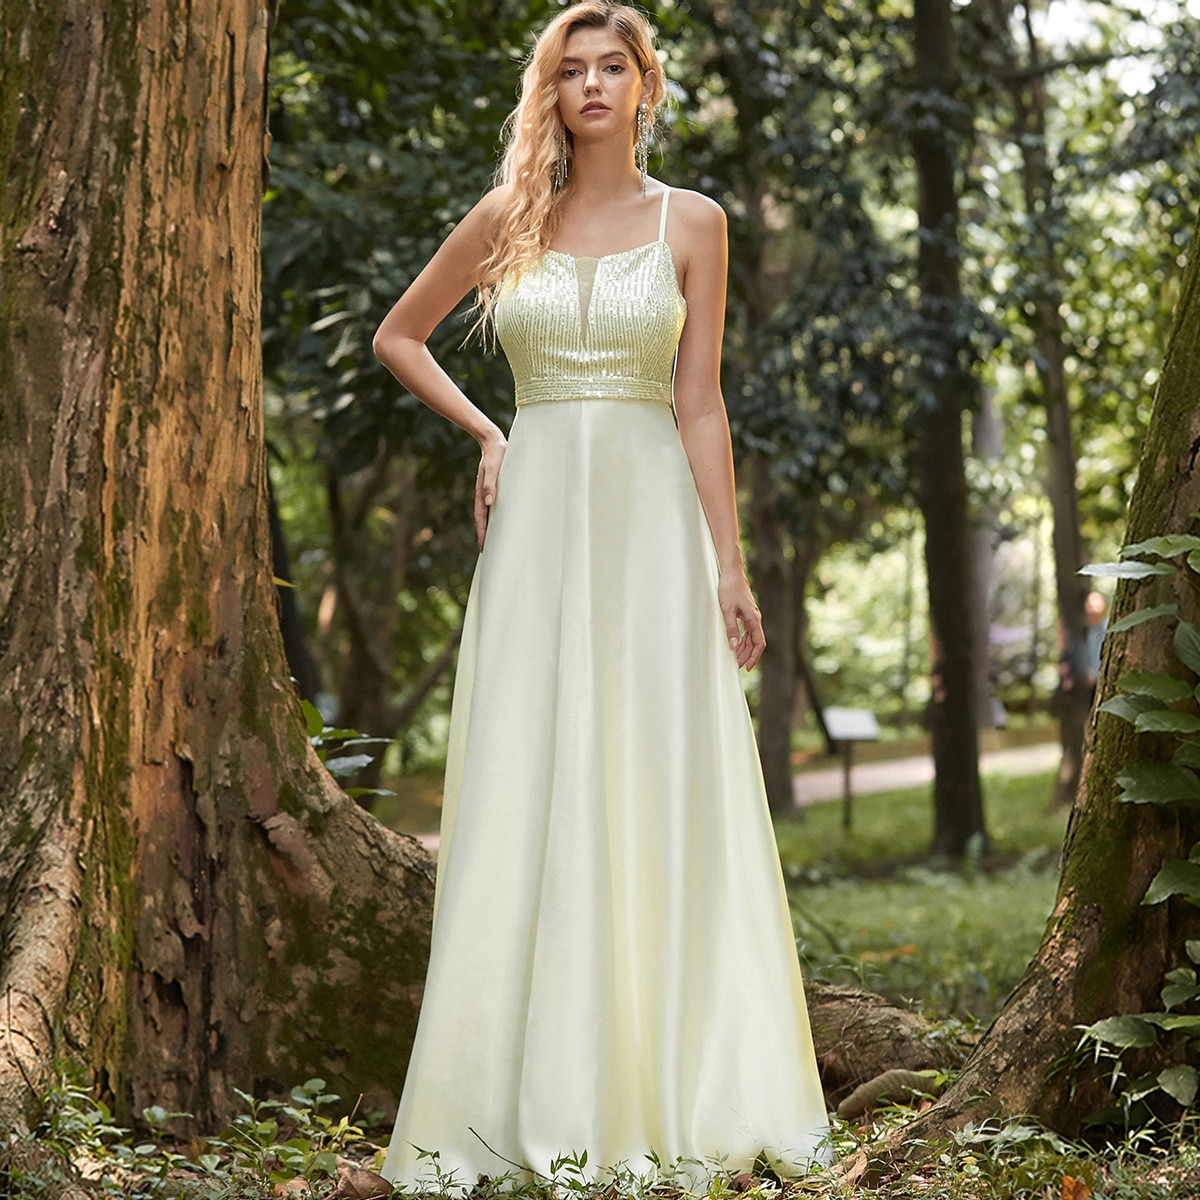 Contrast Sequin Satin Cami Prom Dress